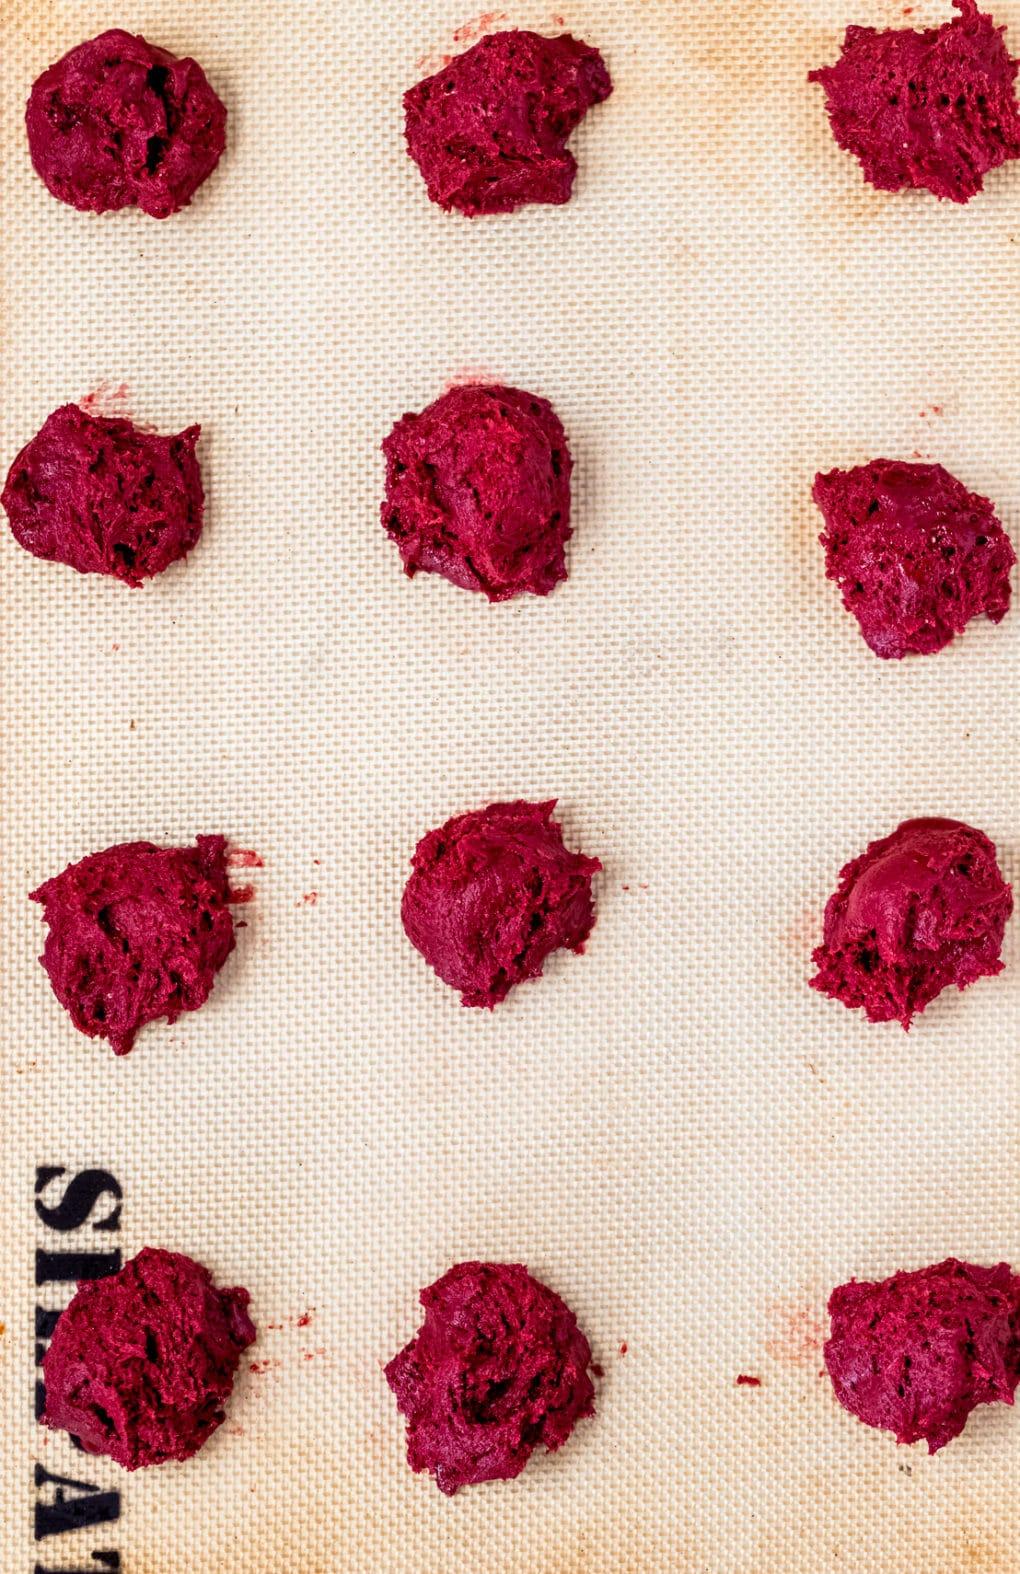 balls of red velvet whoopie pie dough on a silpat-lined baking sheet